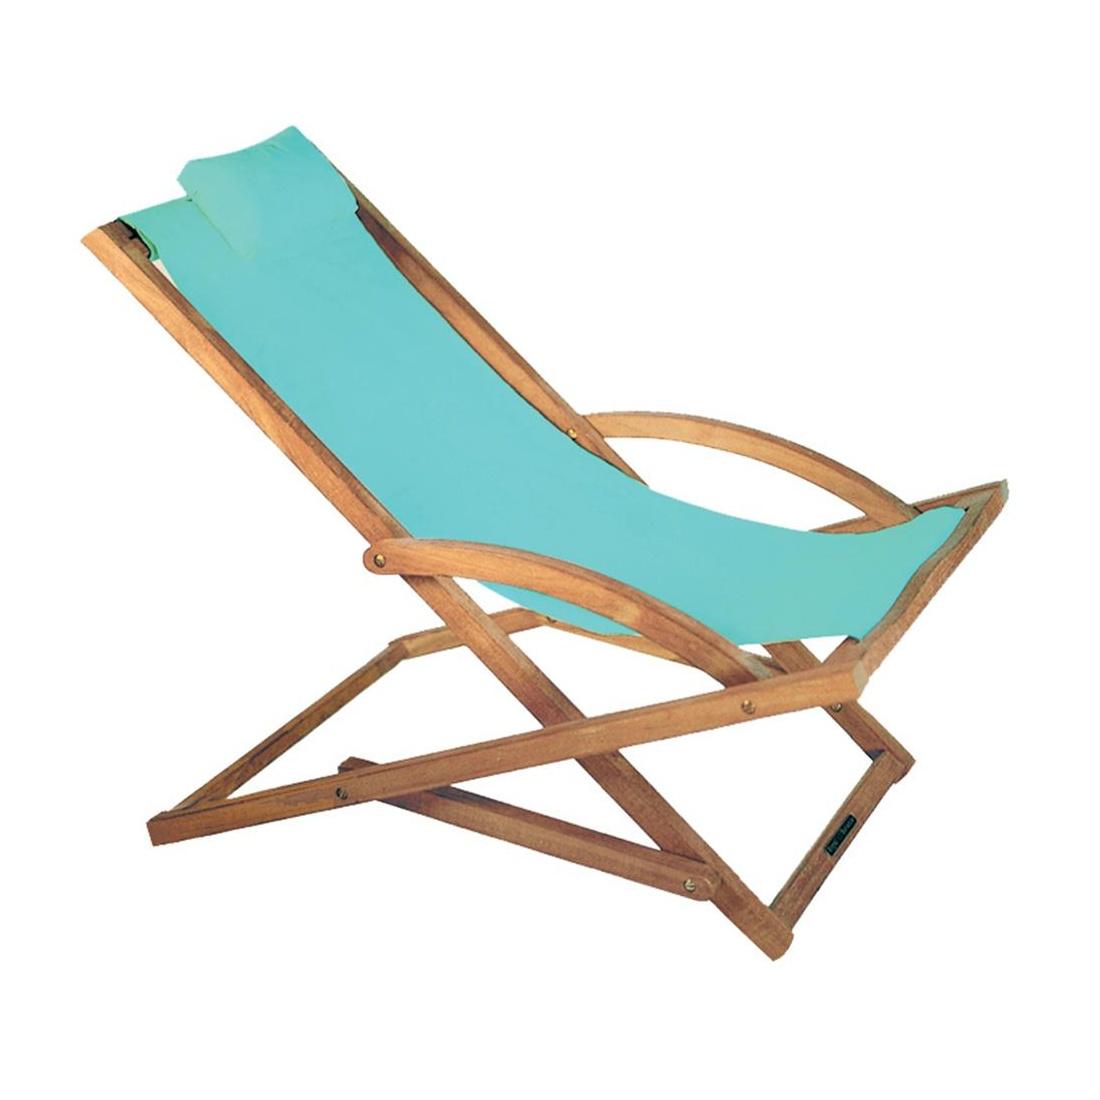 Royal Botania - Beacher Sonnenliege - hellblau/Batyline/Gestell teak/inkl. Nackenkissen | Garten > Gartenmöbel > Gartenliegen | Hellblau | Teak| kunststoff | Royal Botania